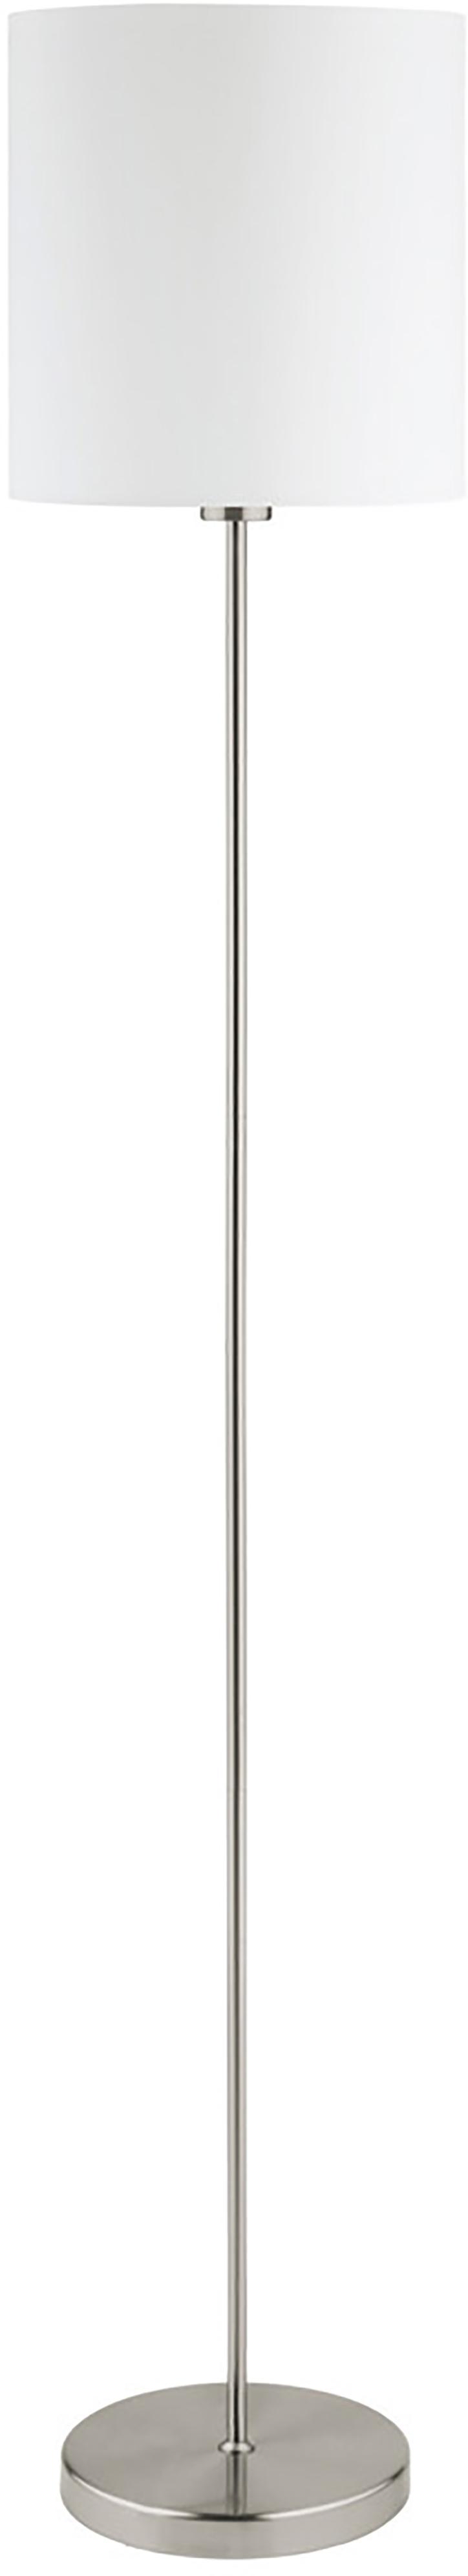 Lampada da terra Harry, Paralume: tessuto, Base della lampada: metallo nichelato, Bianco, argentato, Ø 28 x Alt. 158 cm